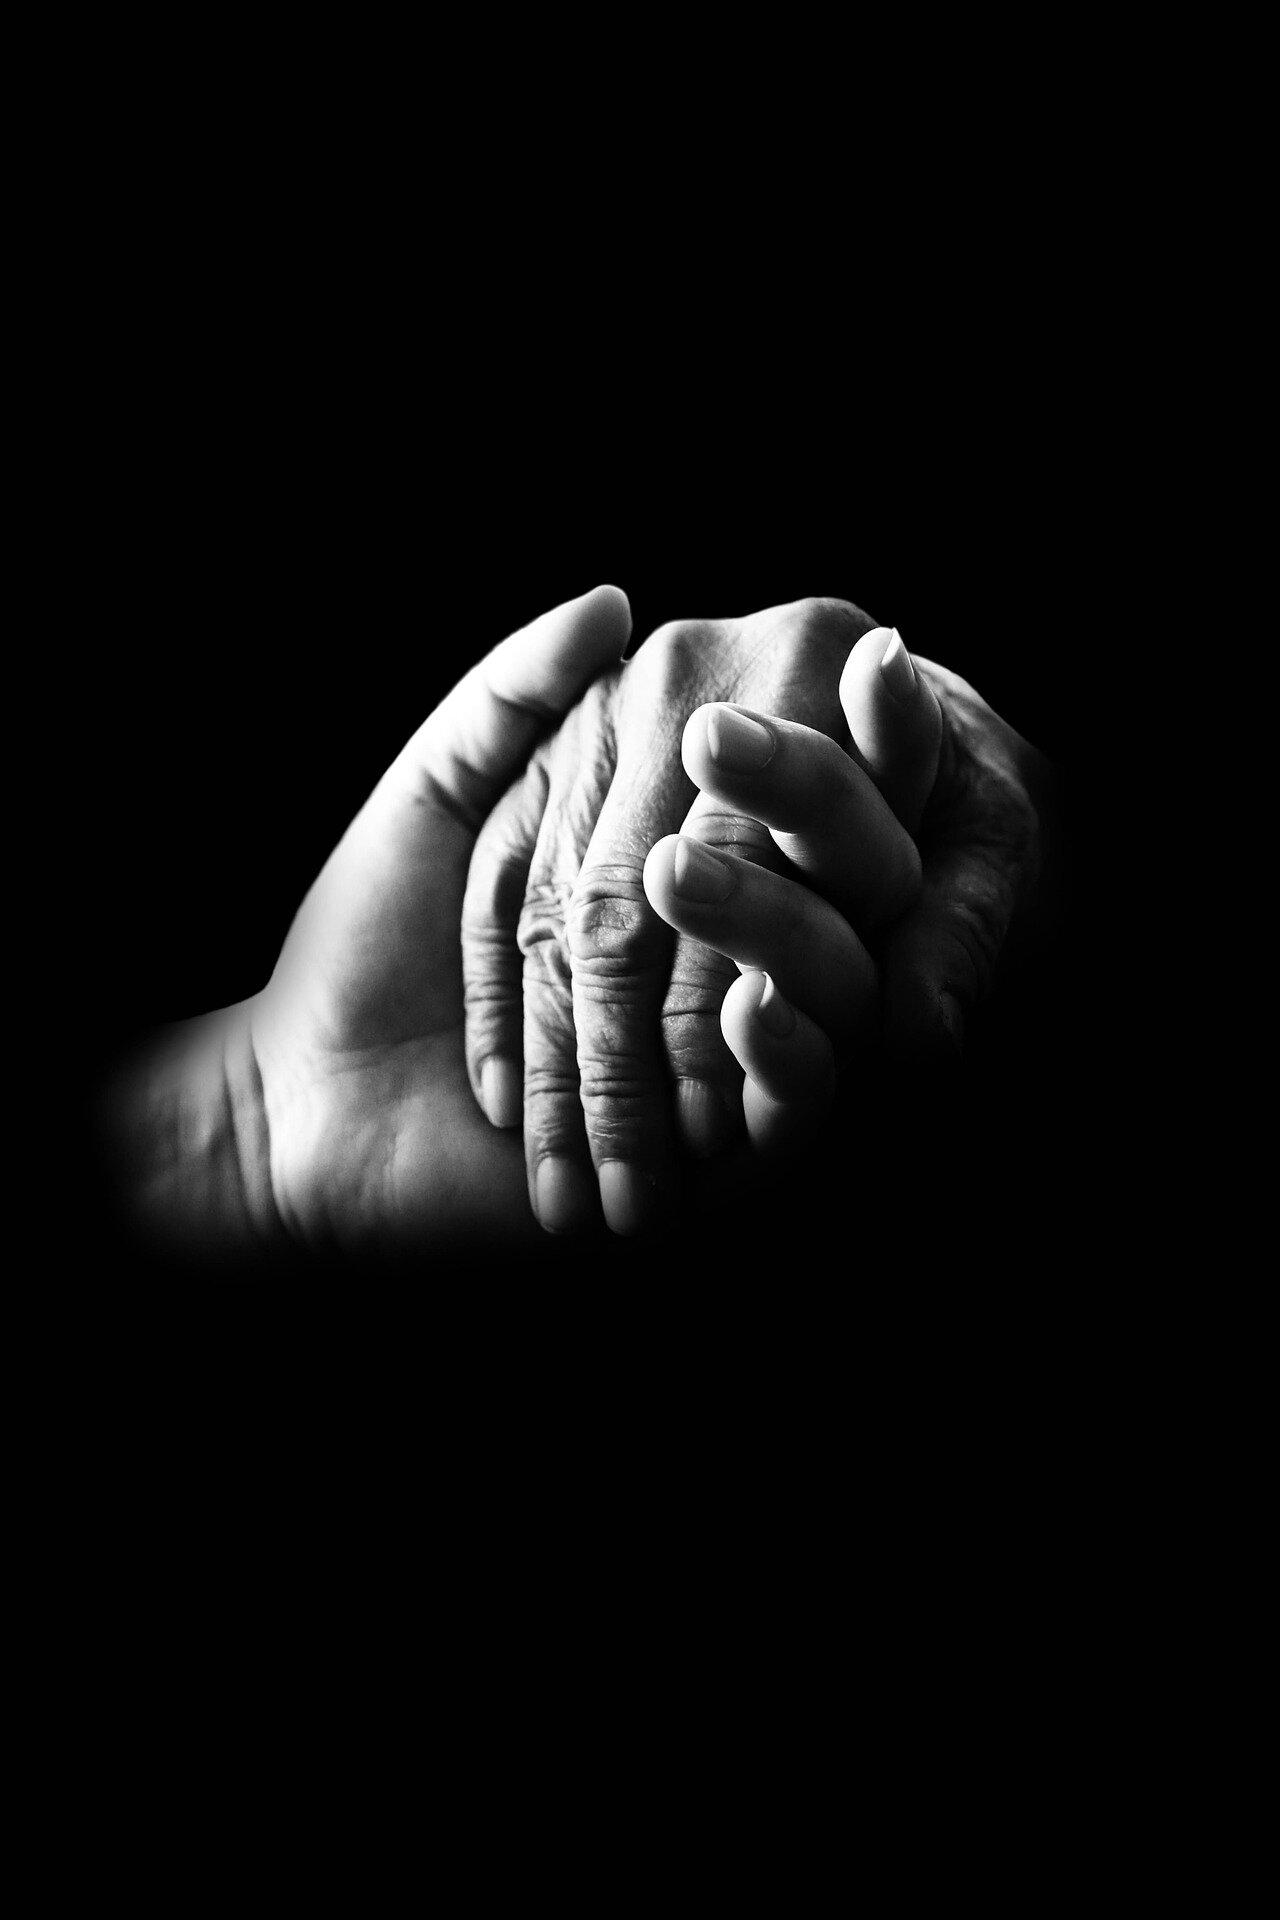 Empathy often avoided because of mental effort - Medical Xpress